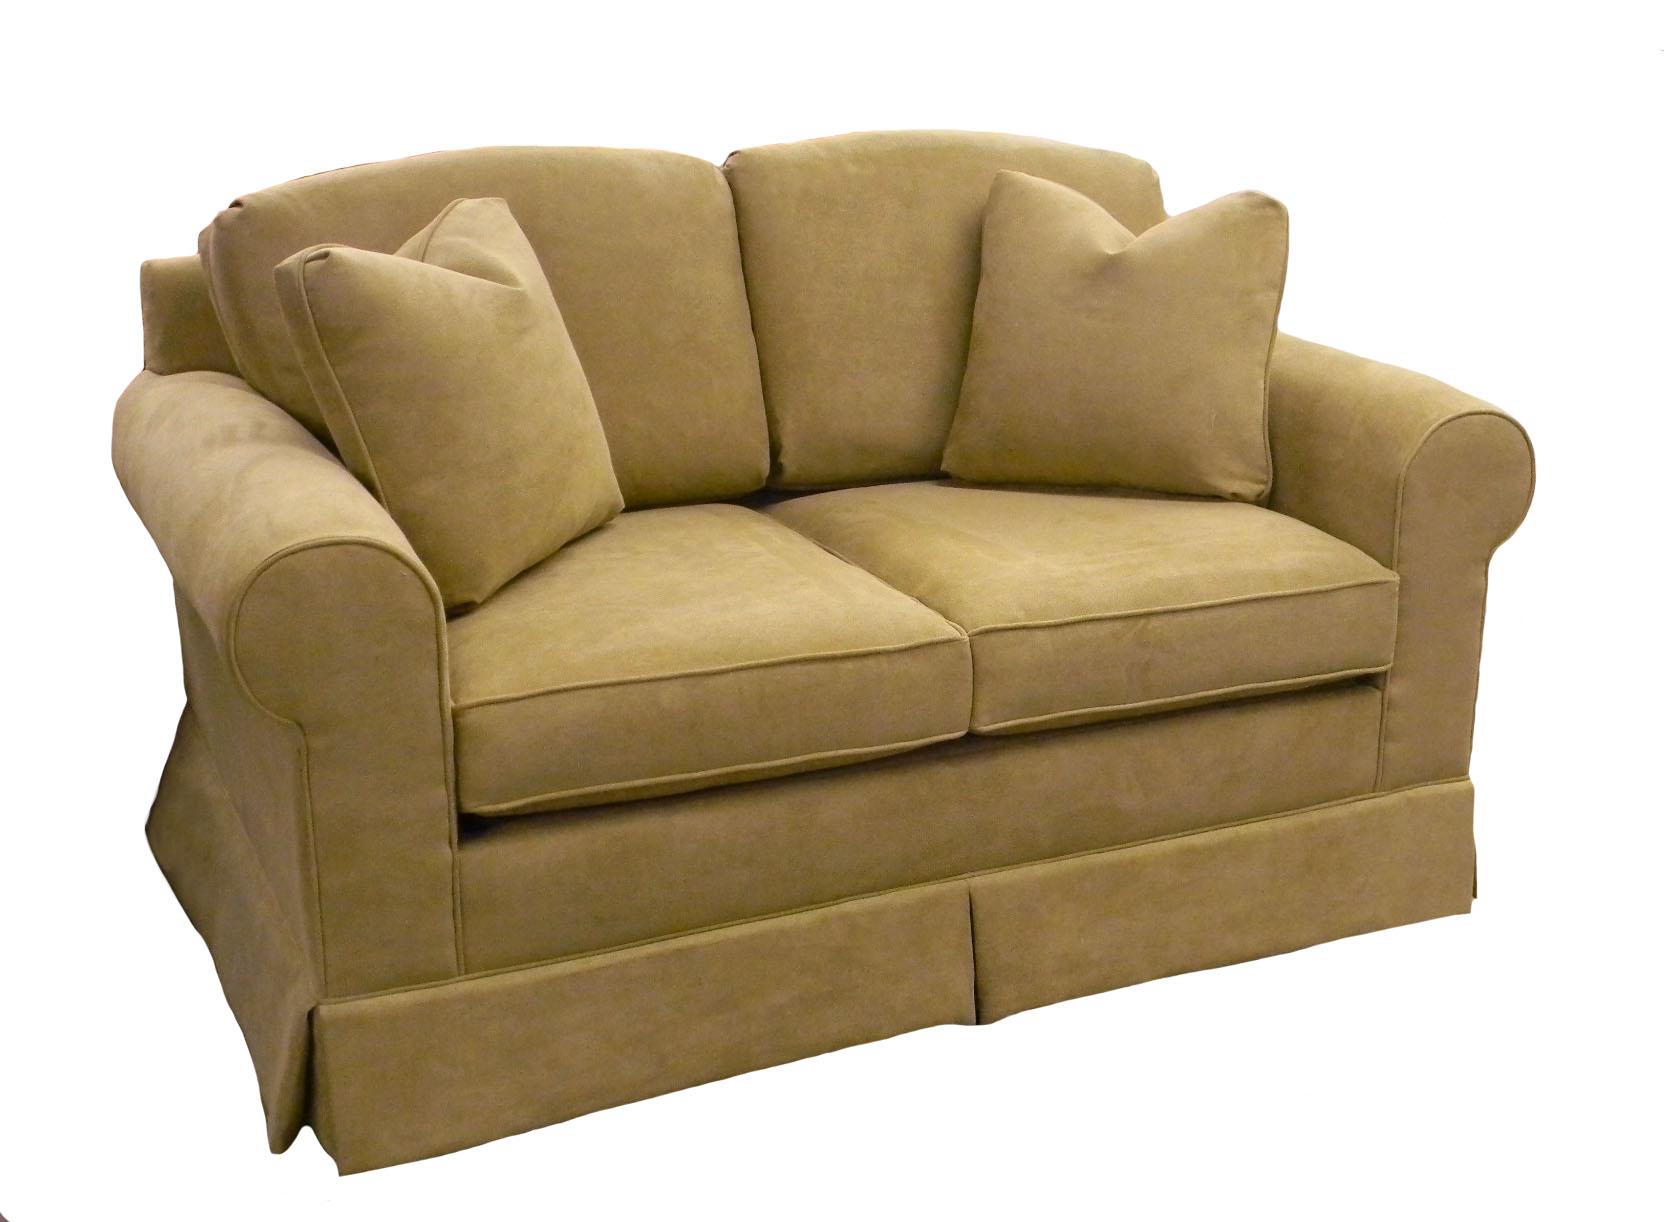 Hughes Twin Sleeper Sofa Chair Small Couch Carolina Chair